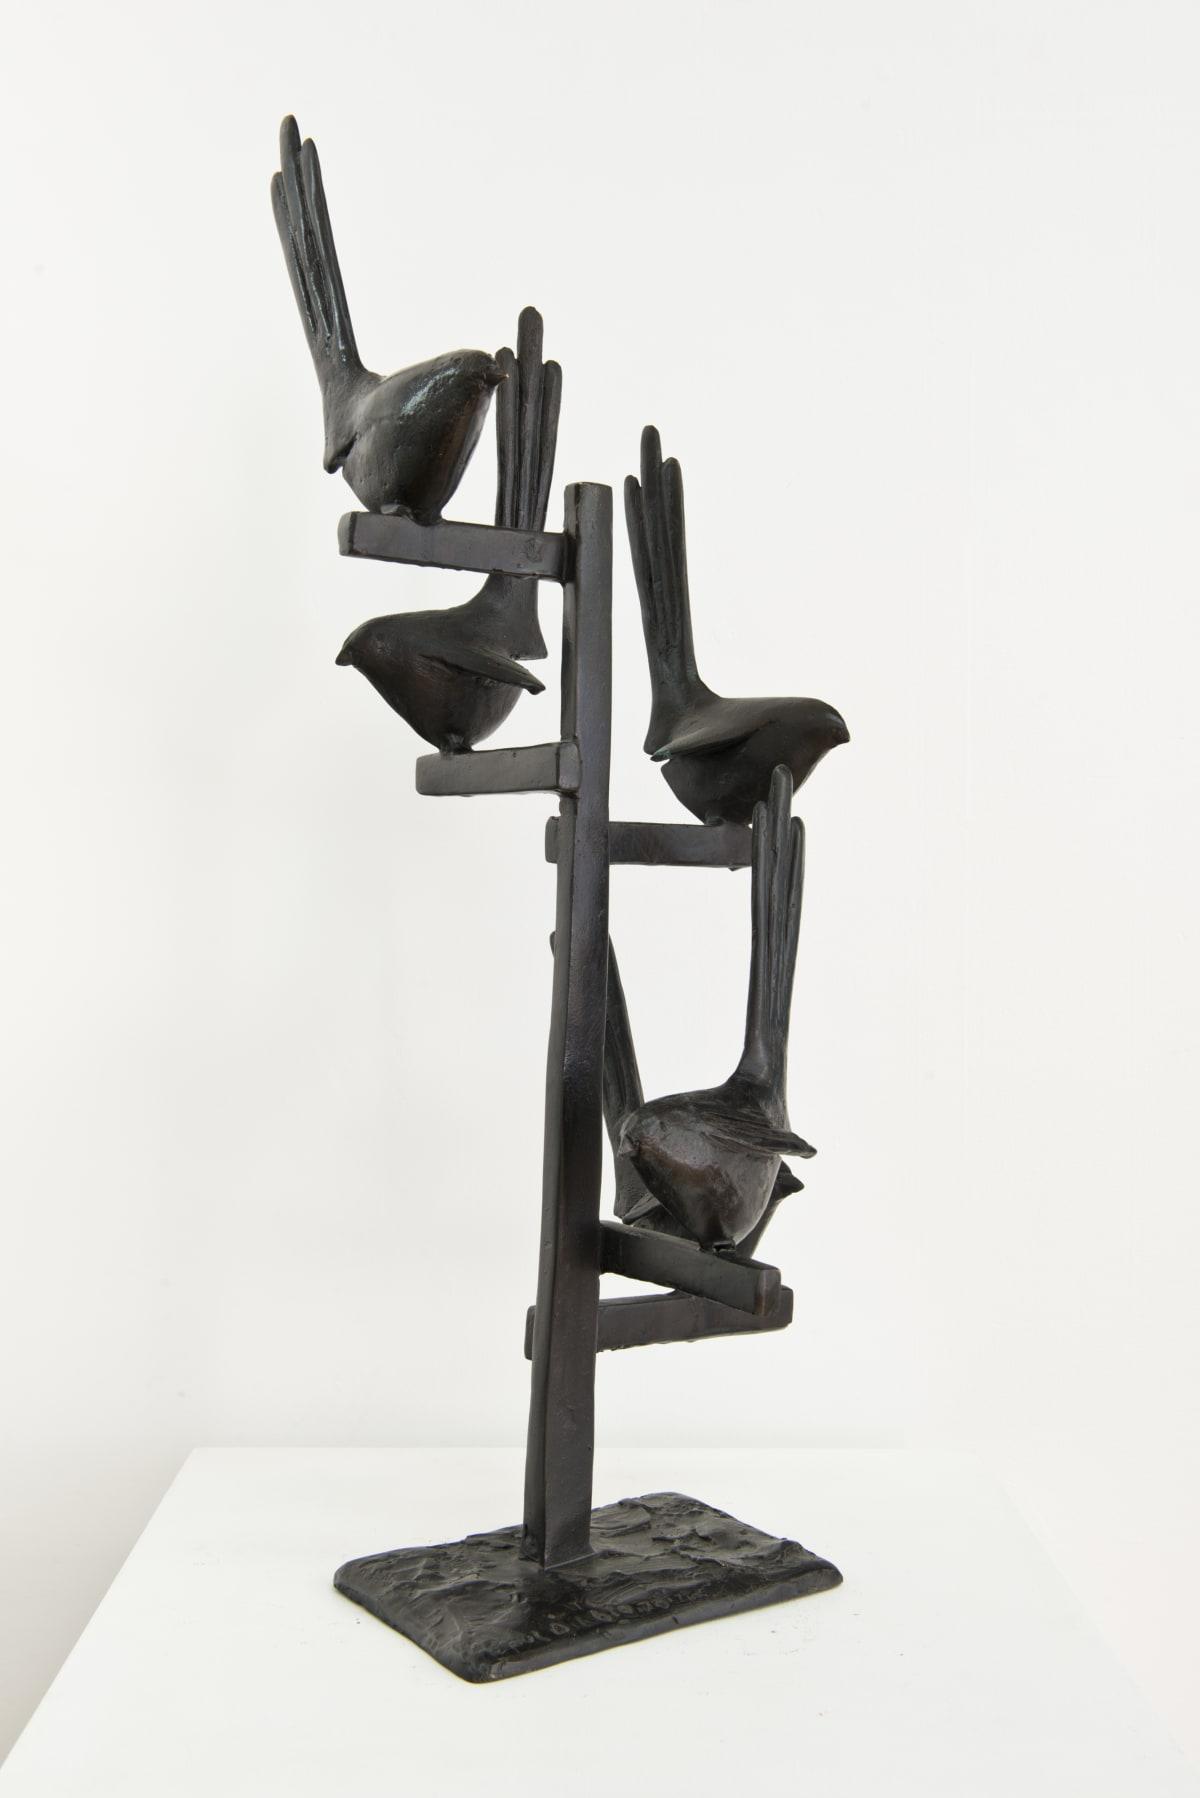 Paul DIBBLE Flock [Model], 2014 Cast Patinated Bronze 27.6 x 9.4 x 7.1 in 70 x 24 x 18 cm